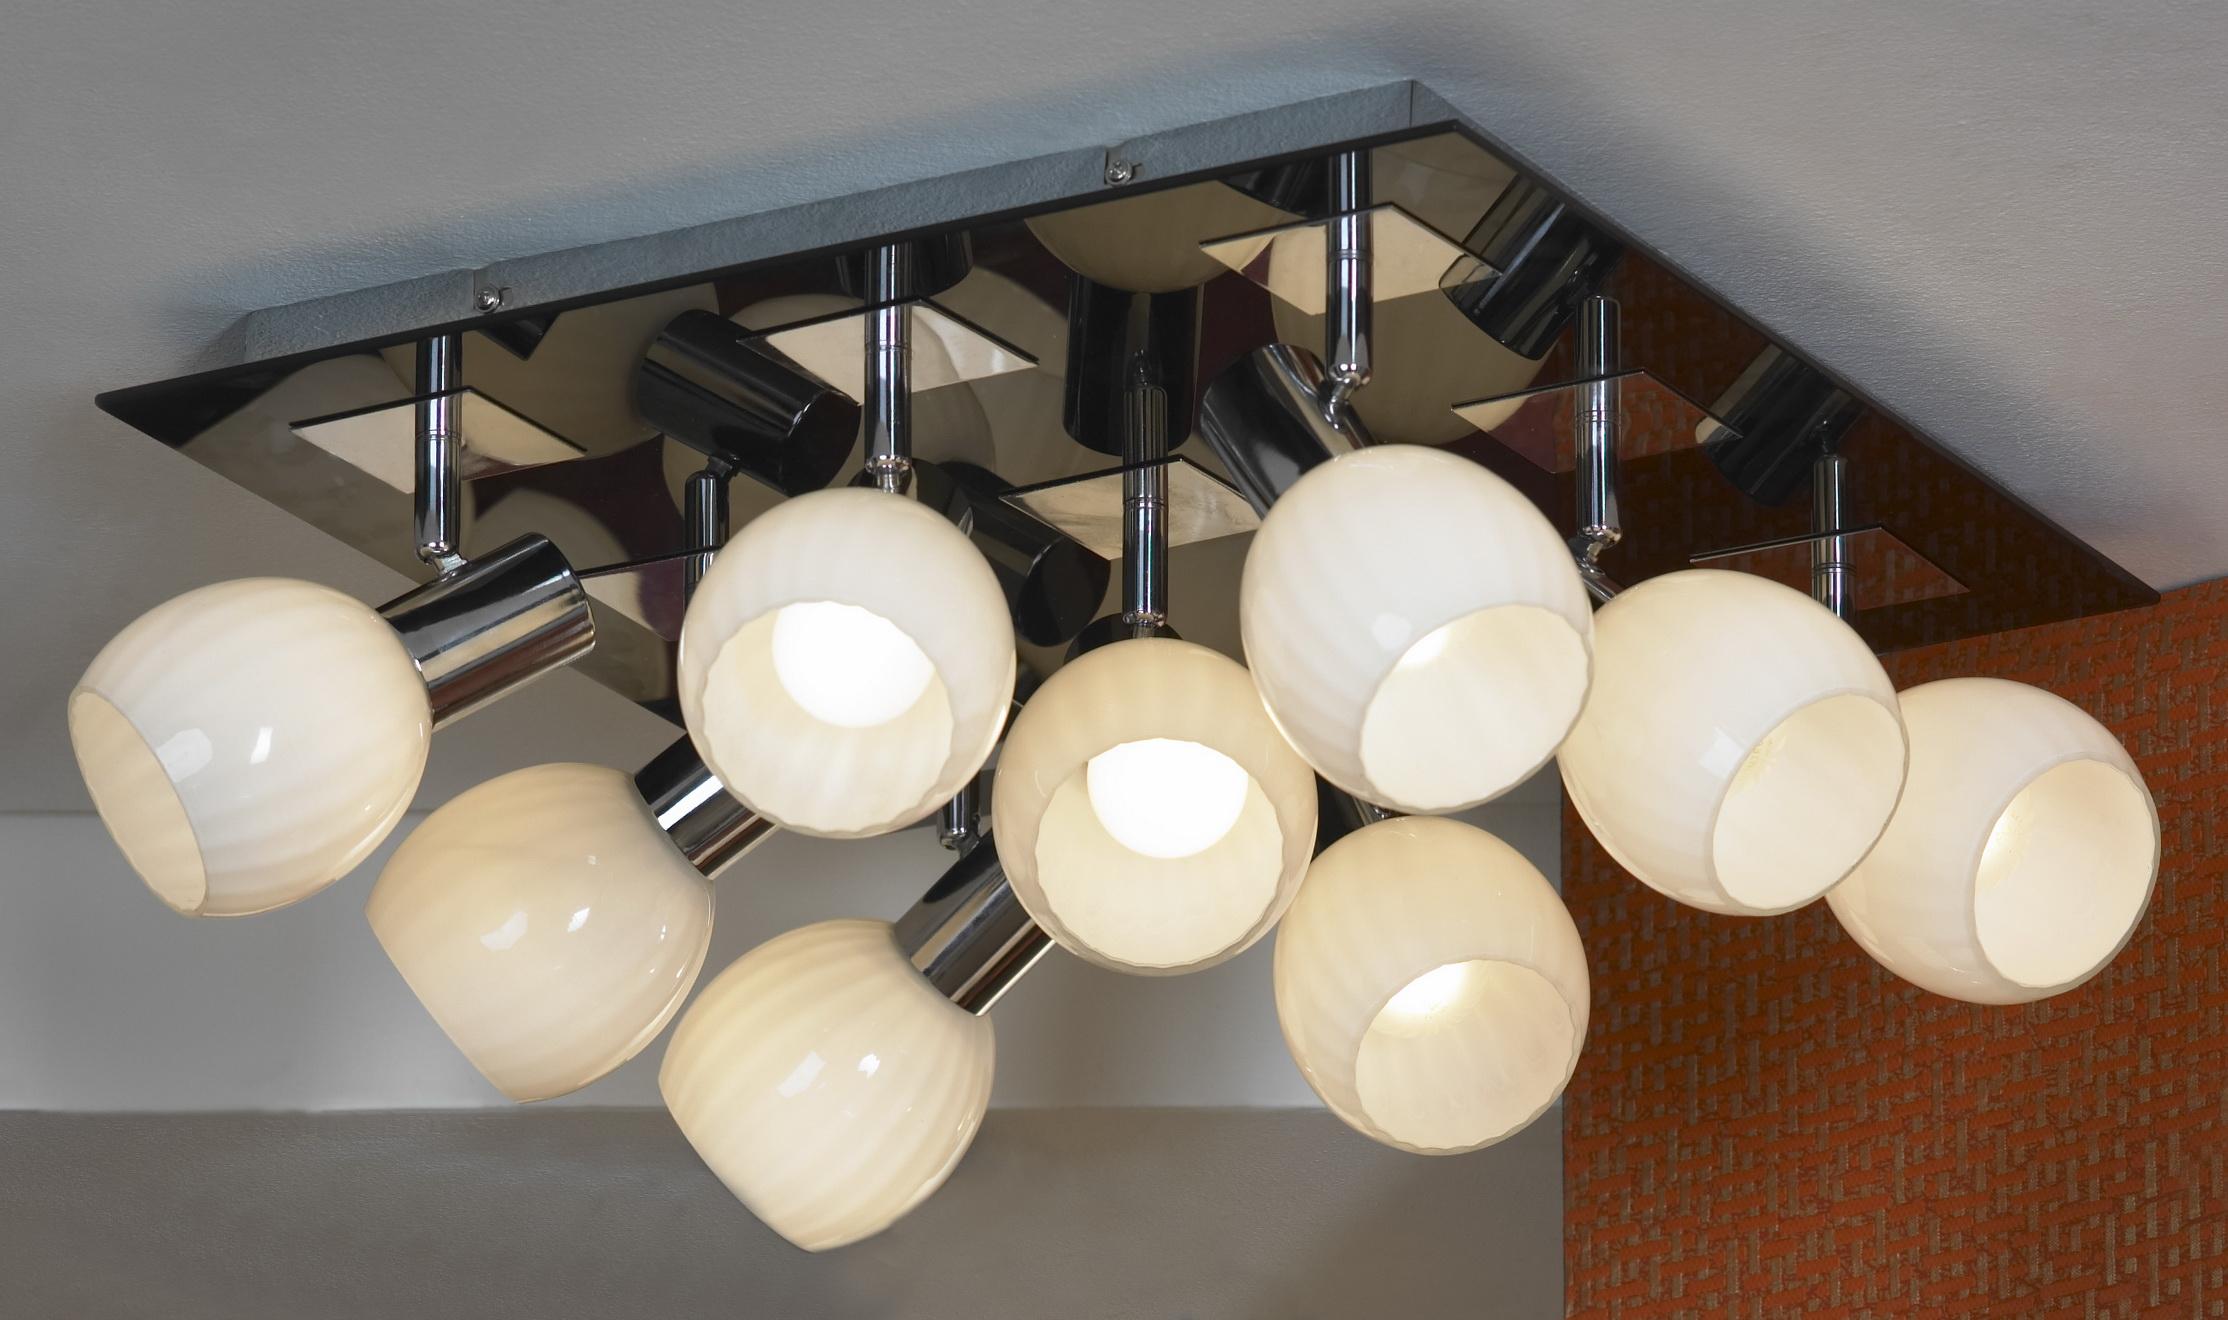 Спот LussoleСпоты<br>Тип: спот,<br>Стиль светильника: модерн,<br>Материал светильника: металл, стекло,<br>Количество ламп: 9,<br>Тип лампы: накаливания,<br>Мощность: 40,<br>Патрон: Е14,<br>Цвет арматуры: хром,<br>Ширина: 430,<br>Длина (мм): 180<br>